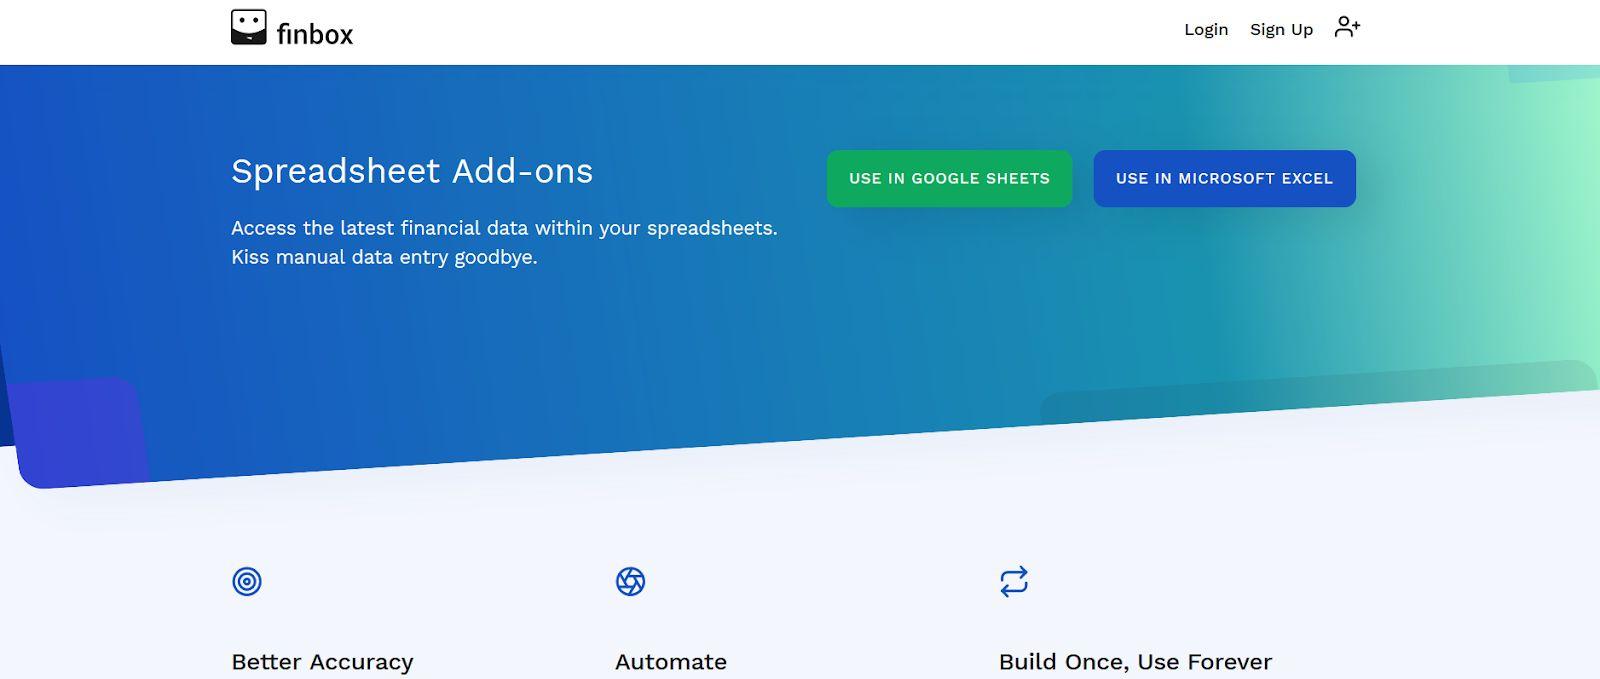 Finbox Homepage